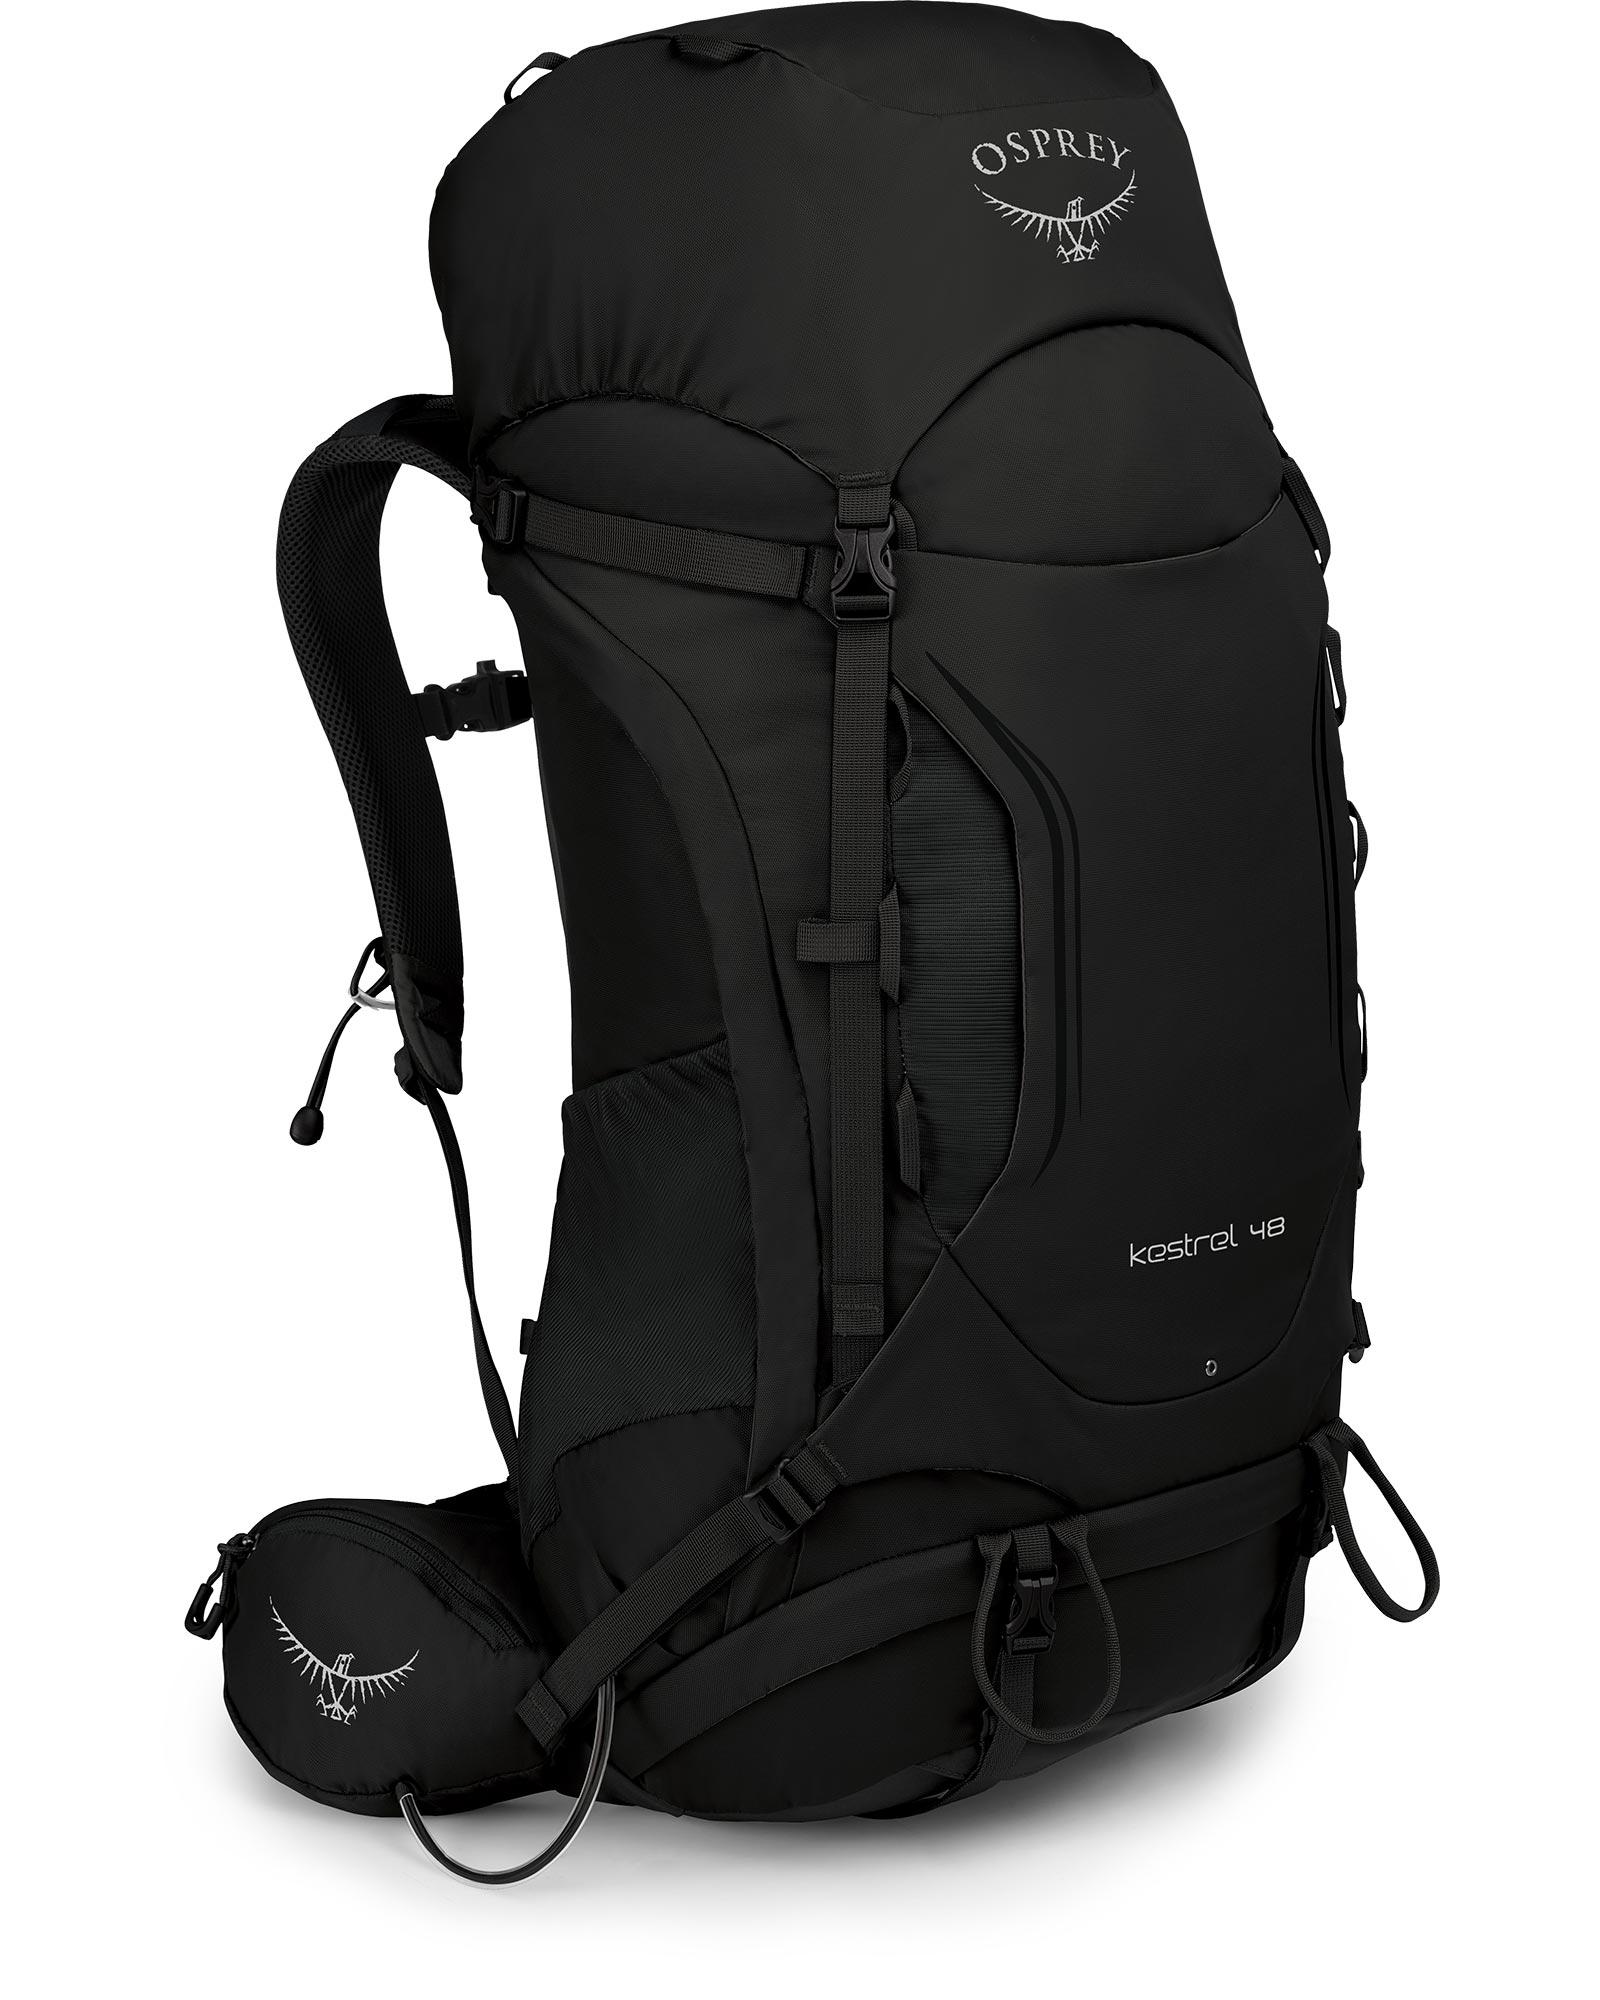 Osprey Men's Kestrel 48 Backpack 0